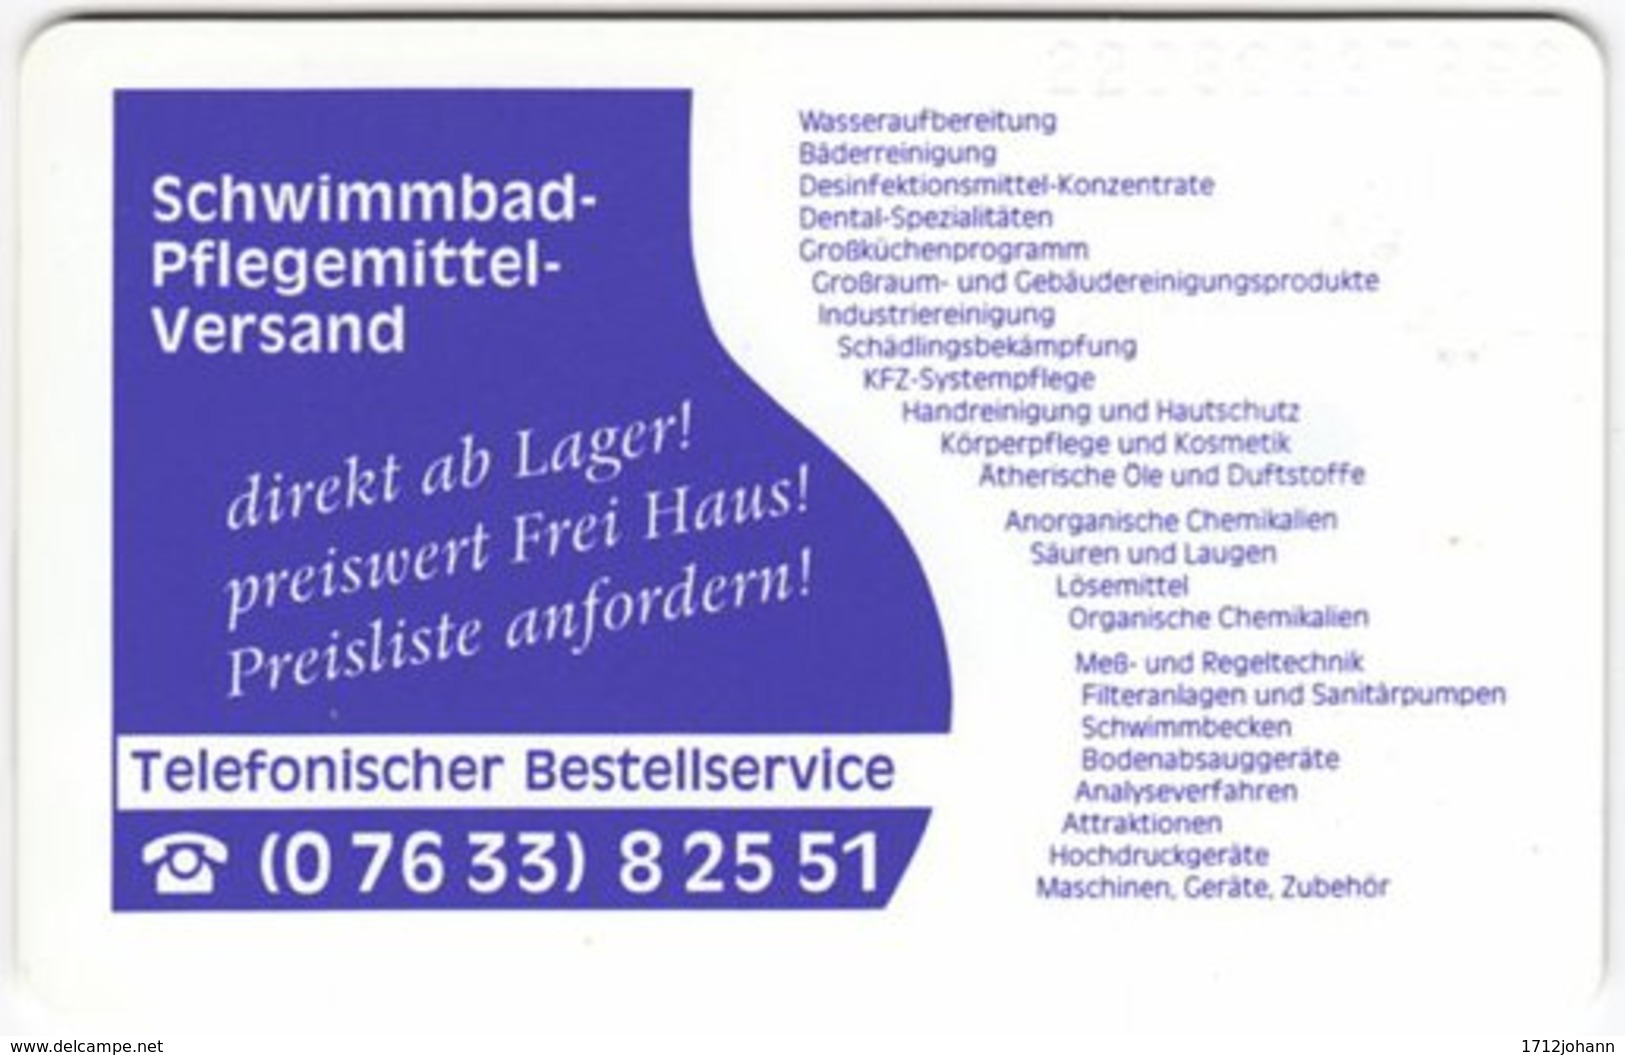 GERMANY O-Serie A-954 - 092 05.92 - MINT - O-Series: Kundenserie Vom Sammlerservice Ausgeschlossen